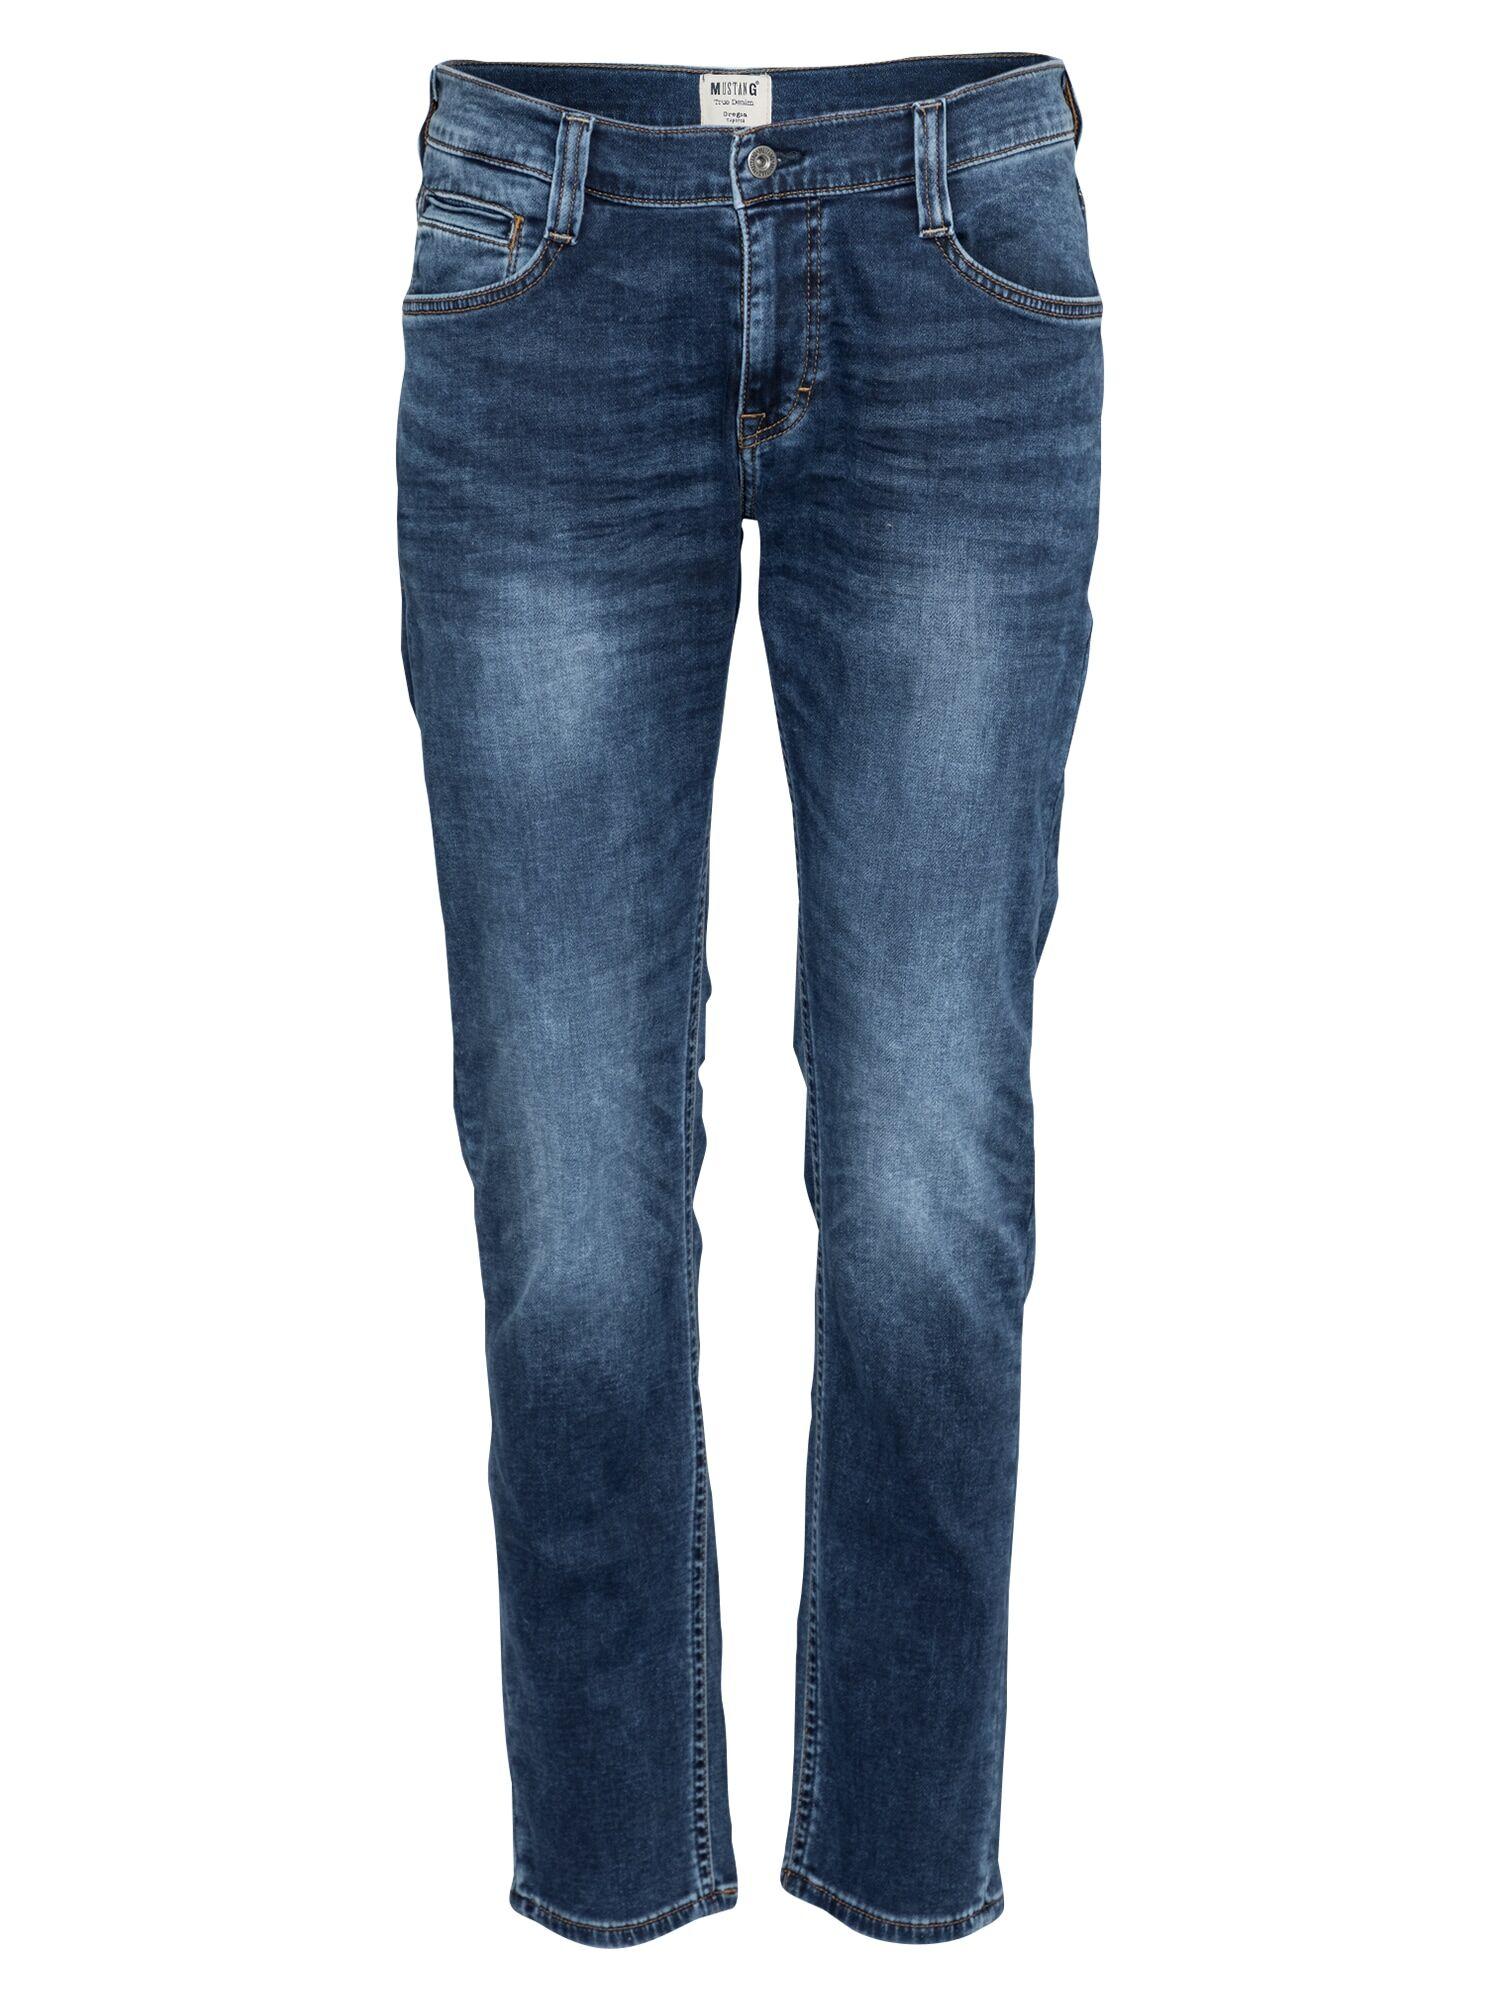 MUSTANG Jean 'Oregon'  - Bleu - Taille: 28 - male